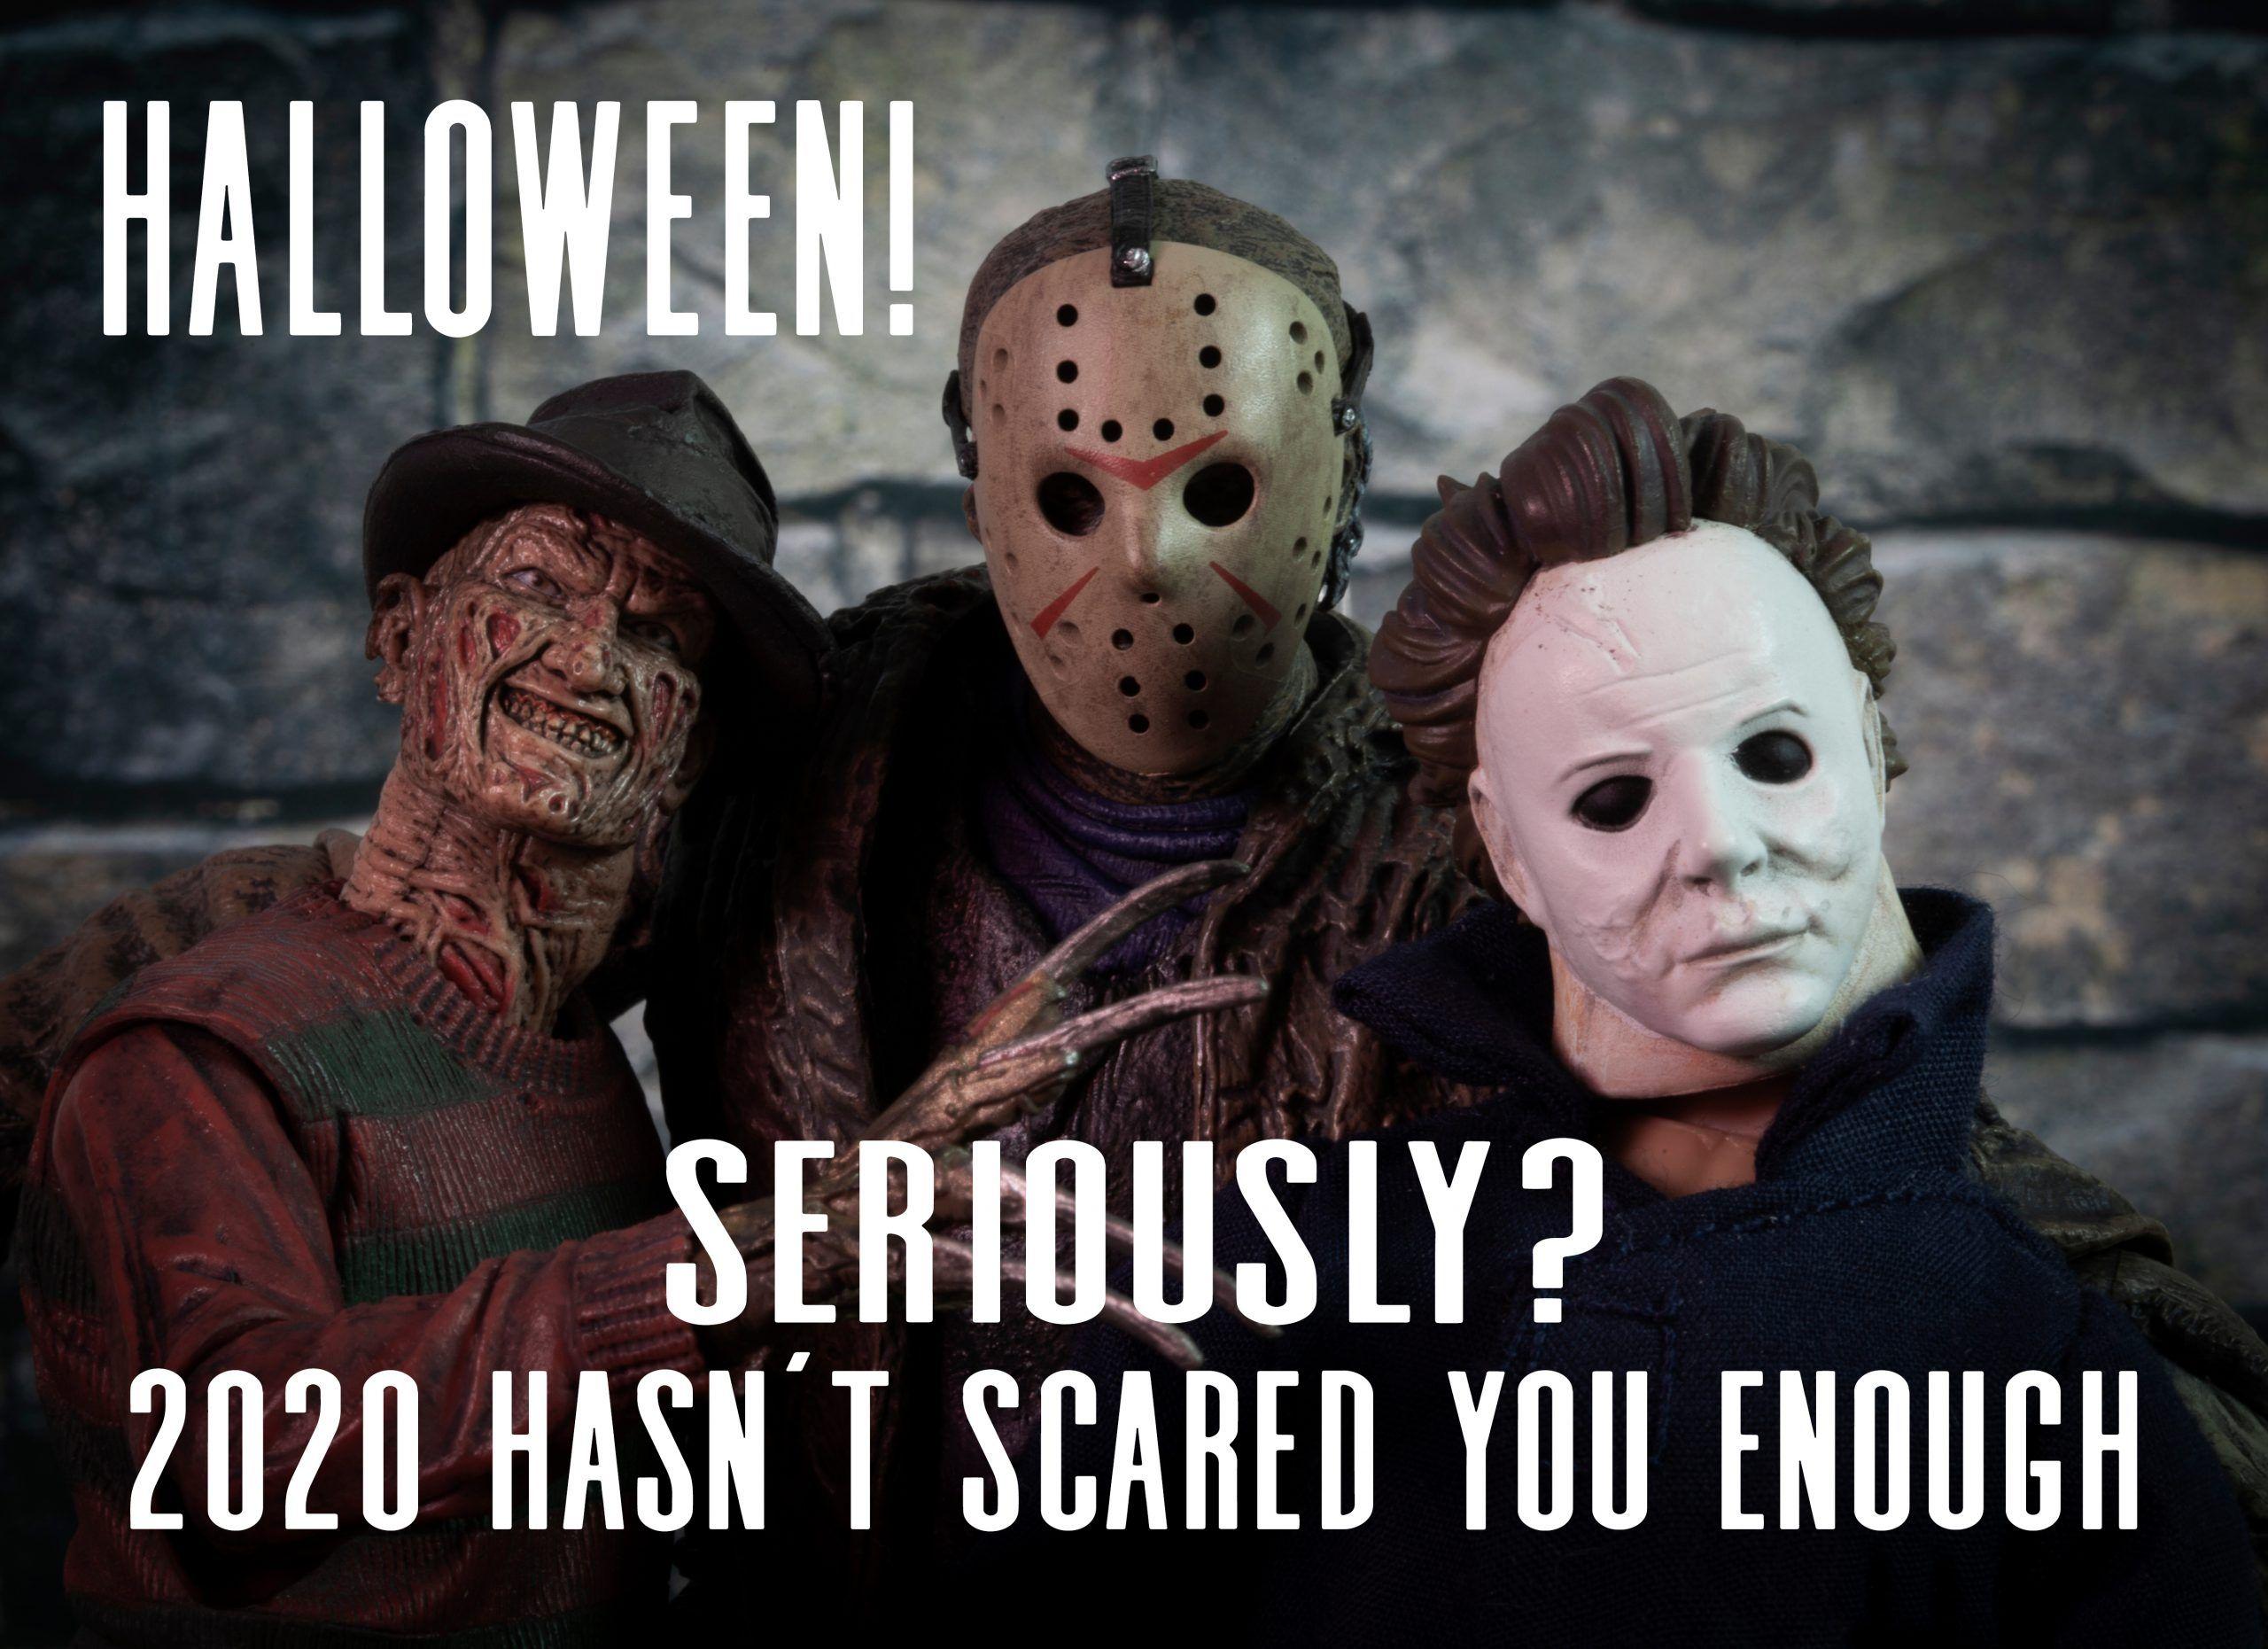 Halloween Memes in 2020 Funny halloween memes, Halloween